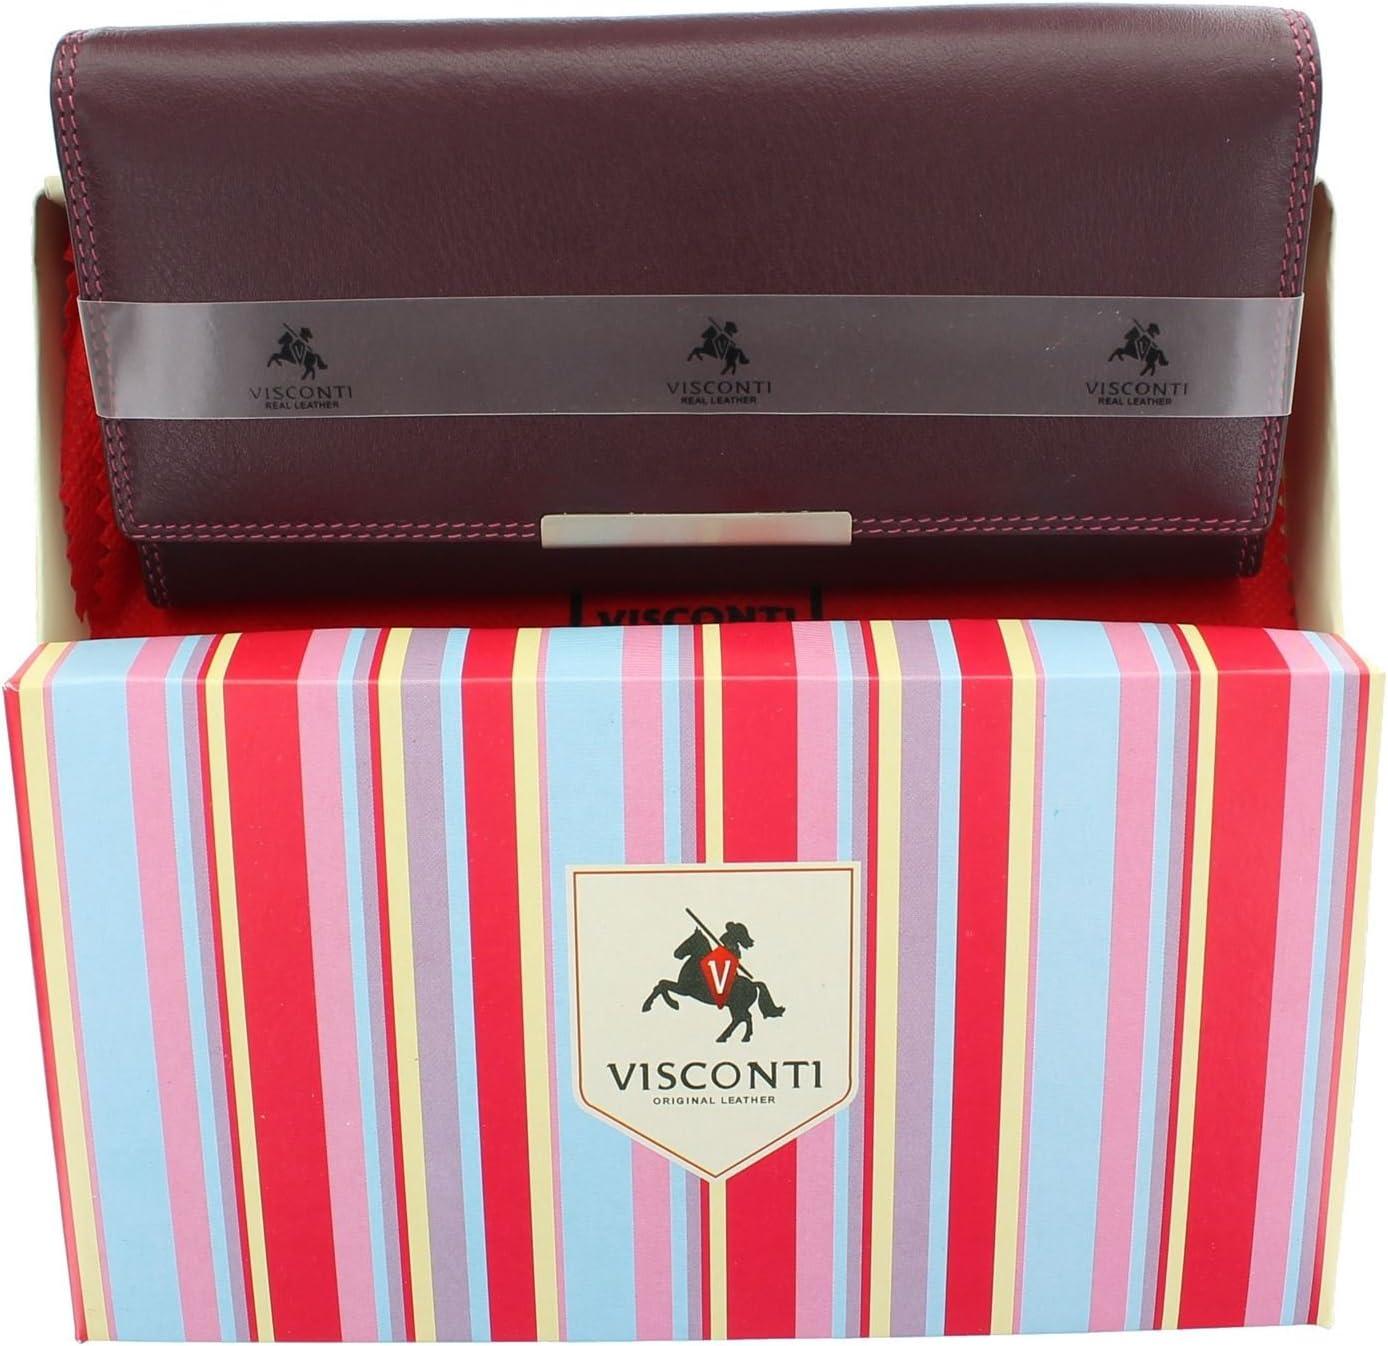 Visconti Soft Leather Rio Ladies Purse Style RFID Blocking R11 Plum Multi